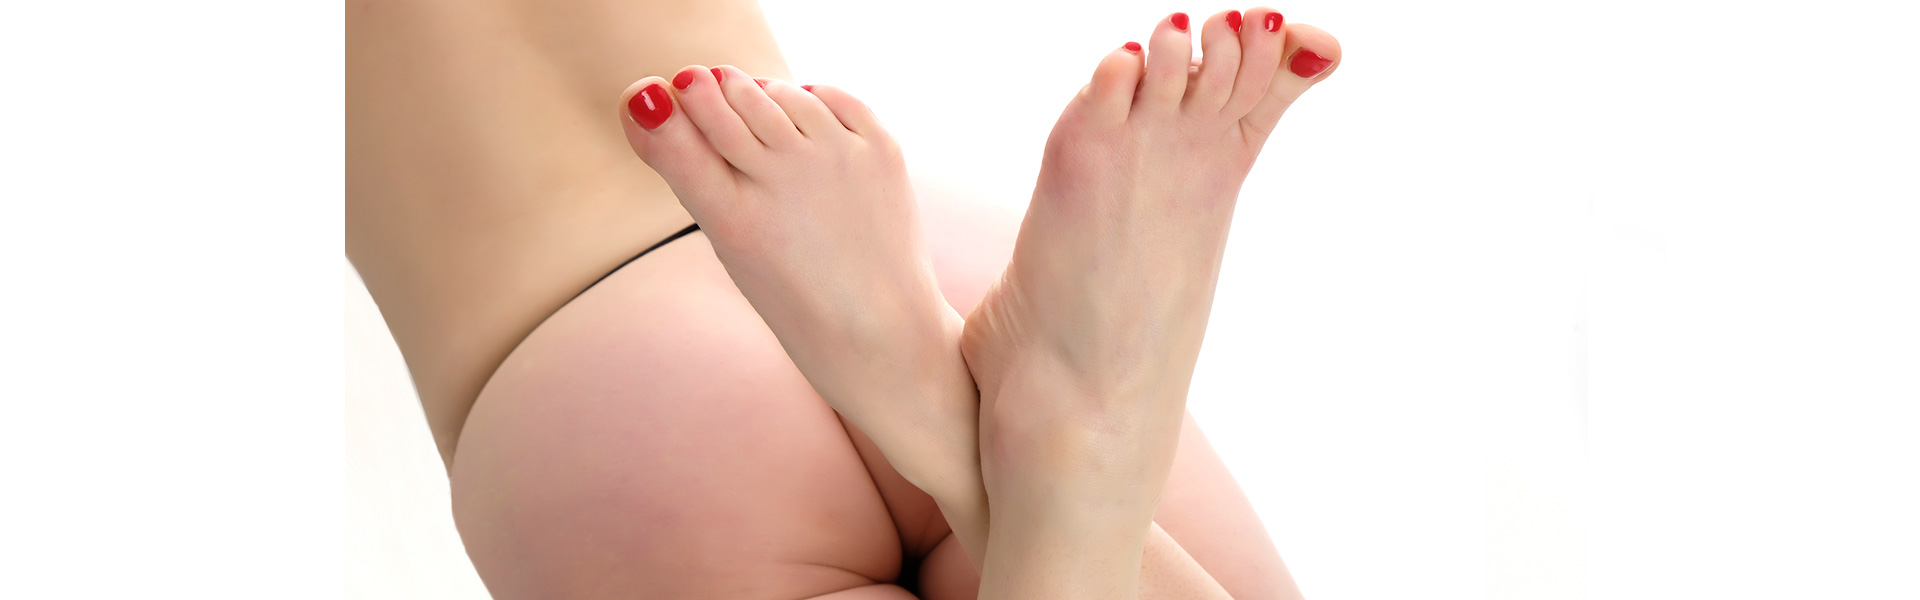 foot-fetish-hampshire